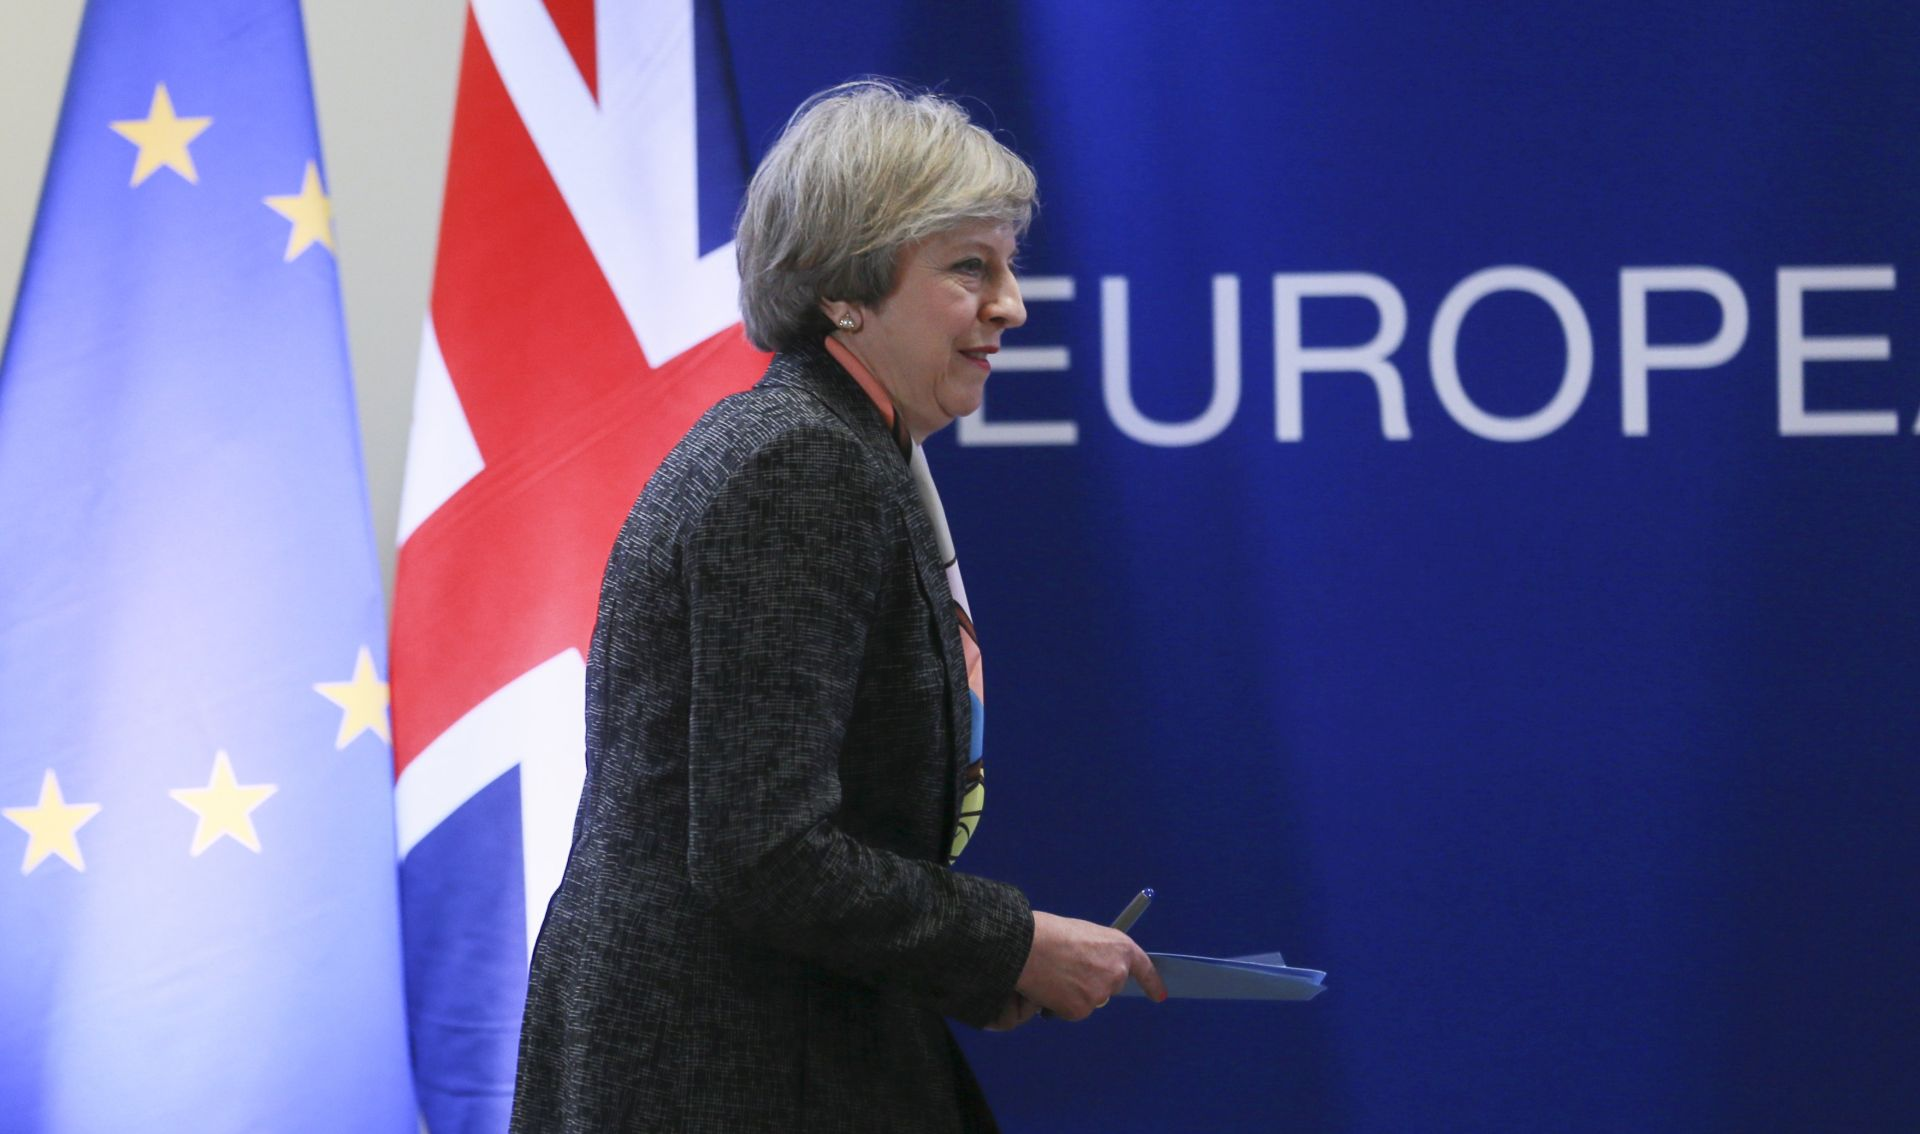 Britanska vlada poziva parlament da usvoji zakon o Brexitu bez izmjena